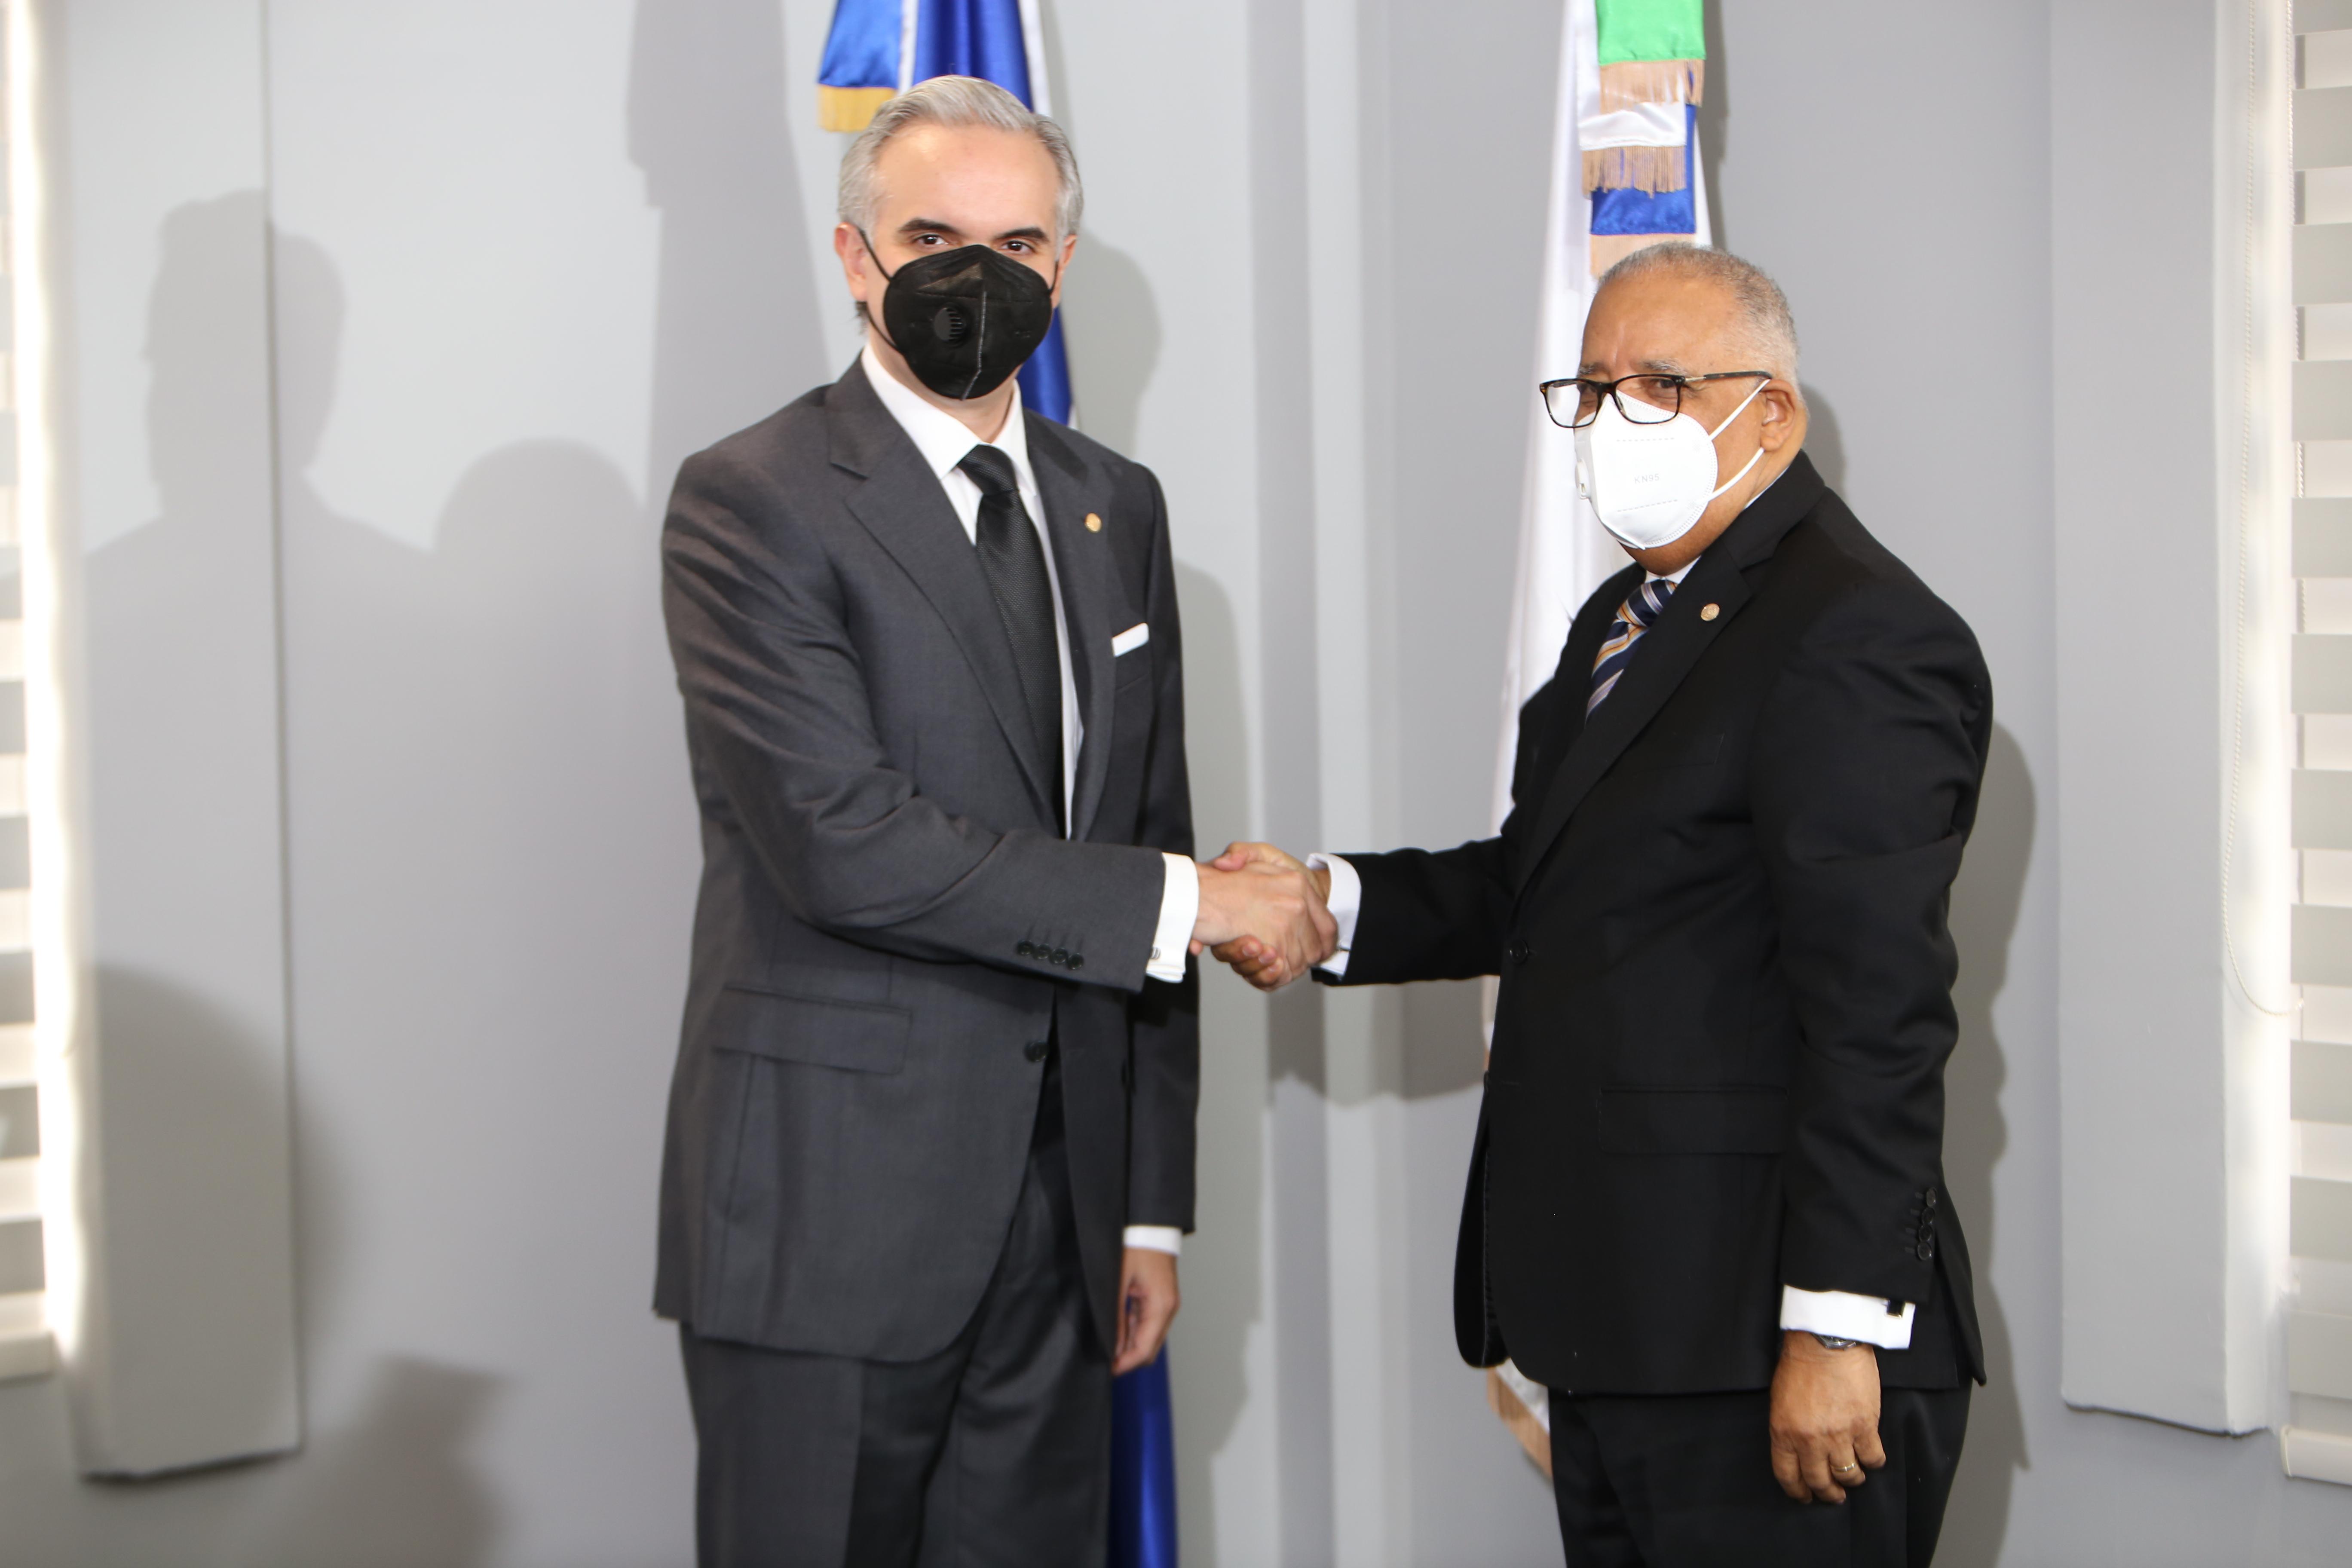 Presidente del CNSS afirma impulsará seguridad social